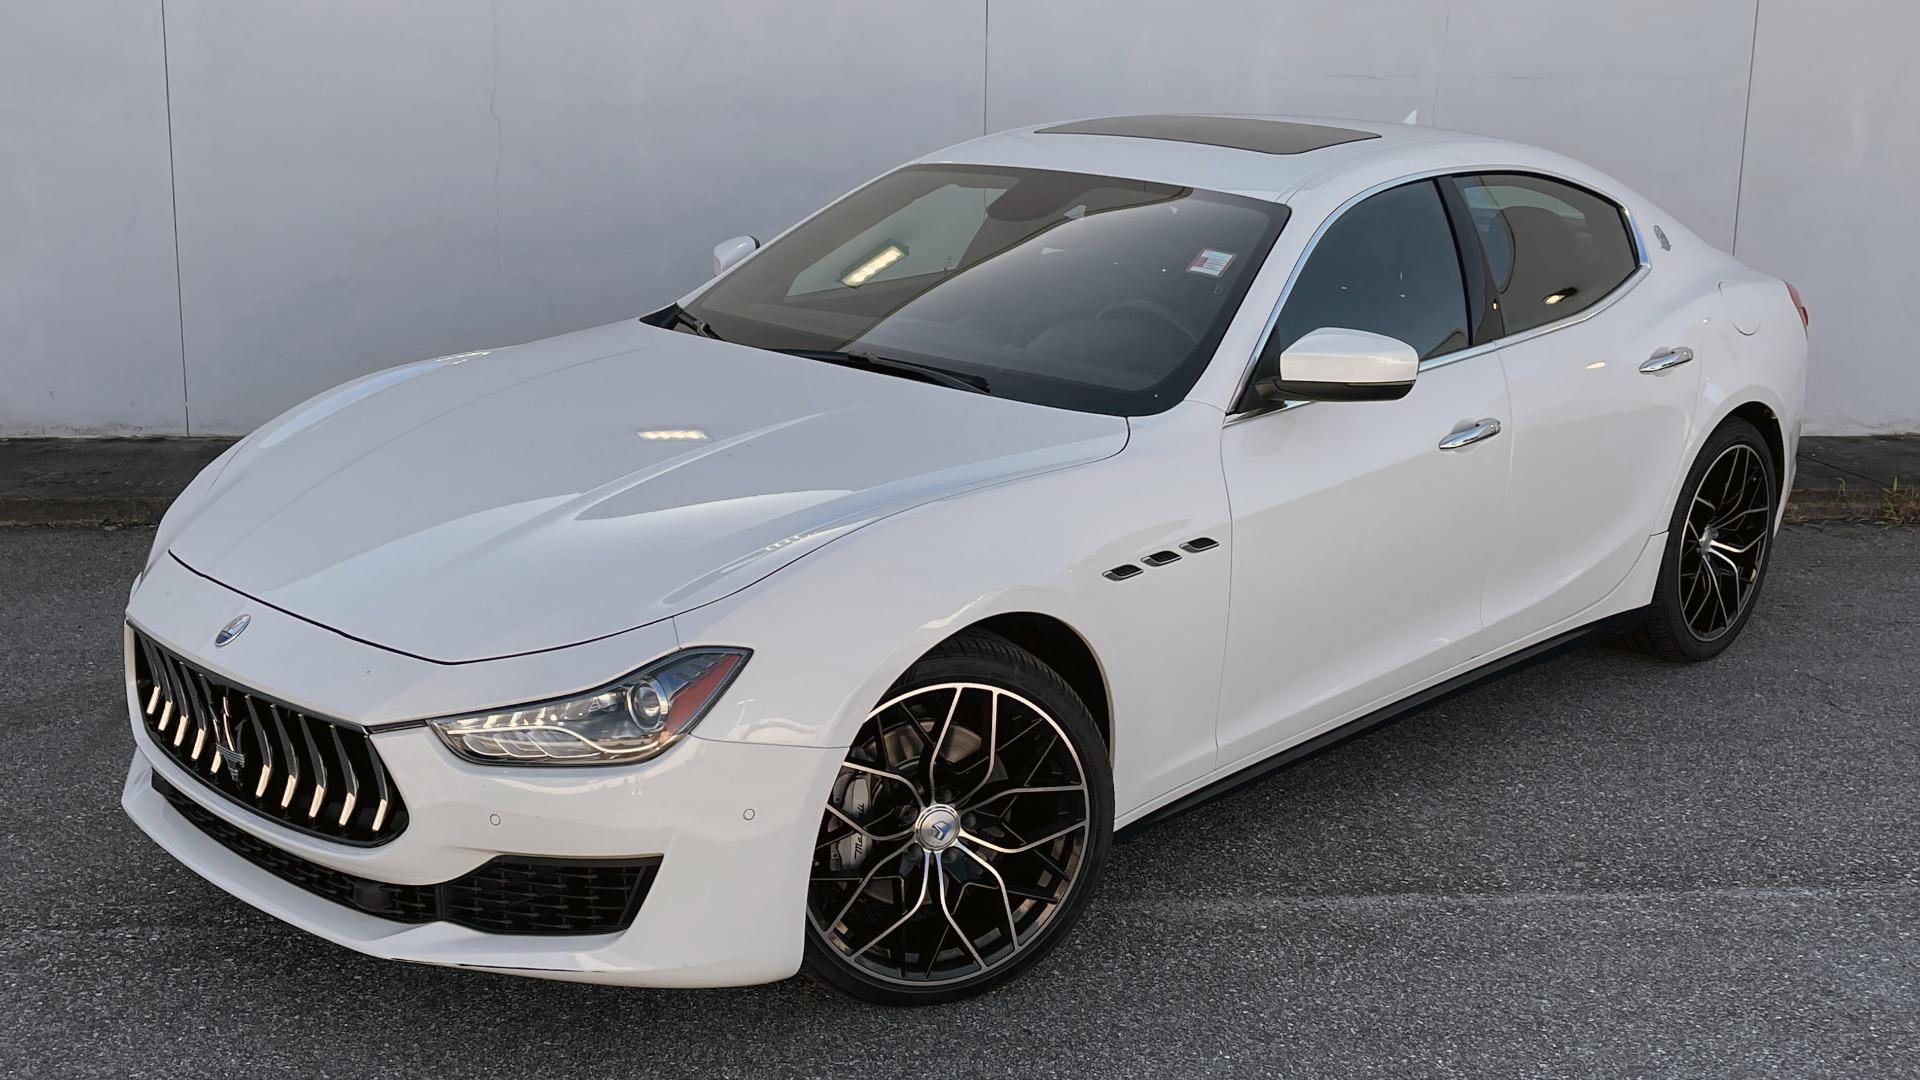 Used 2018 Maserati GHIBLI SEDAN / RWD / 3.0L V6 / SUNROOF / NAV / REARVIEW for sale $42,995 at Formula Imports in Charlotte NC 28227 2